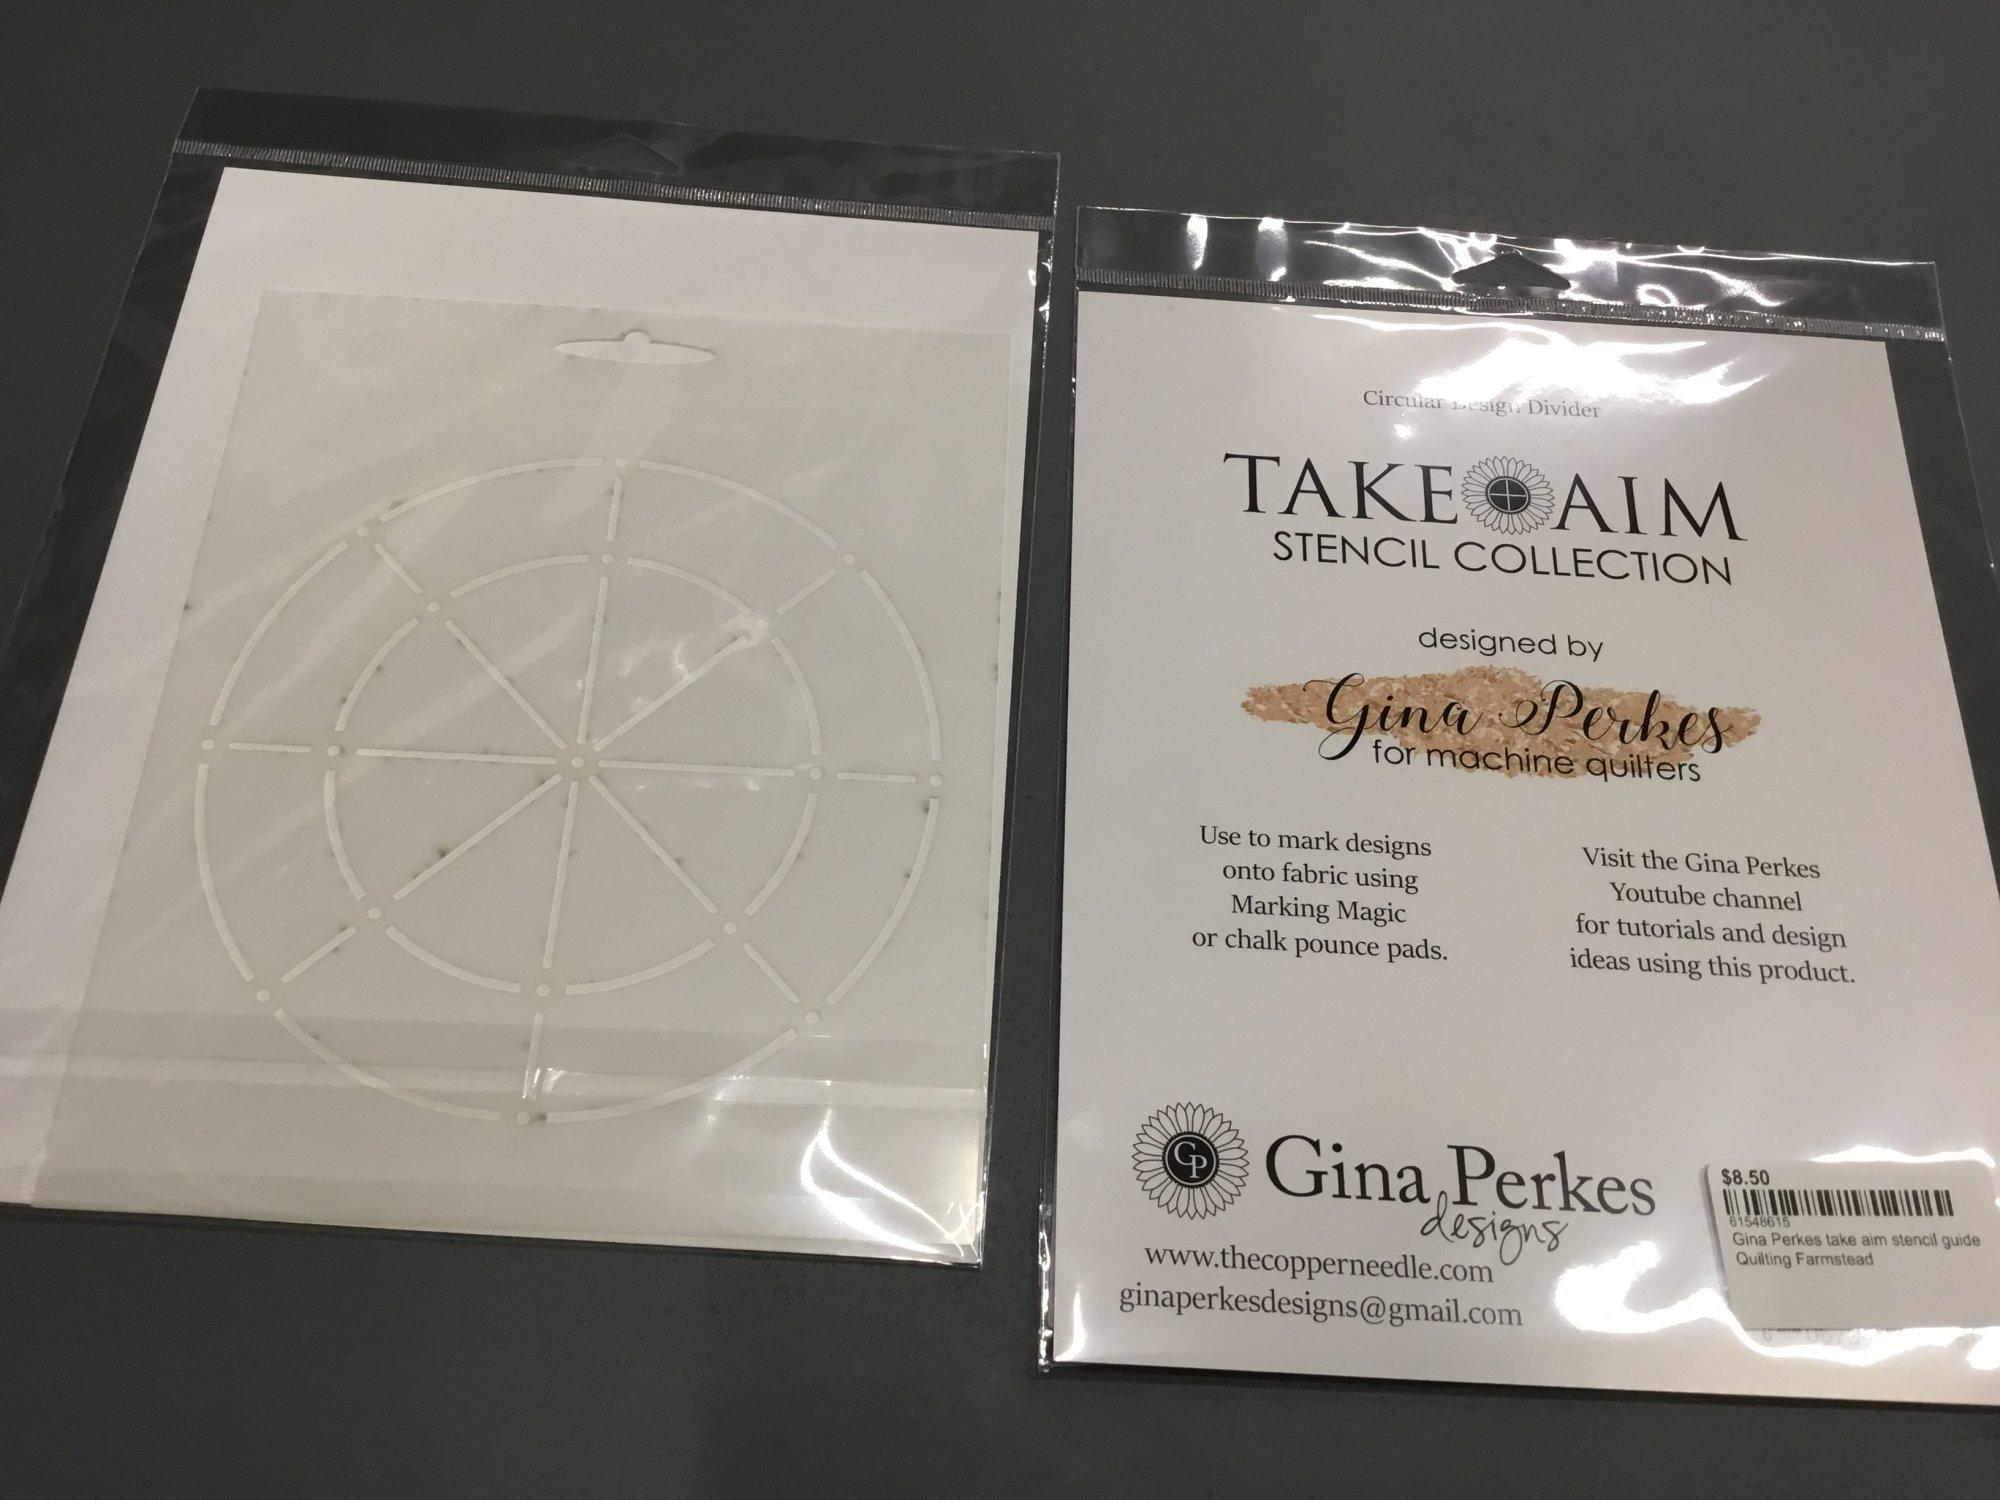 Gina Perkes take aim stencil guide